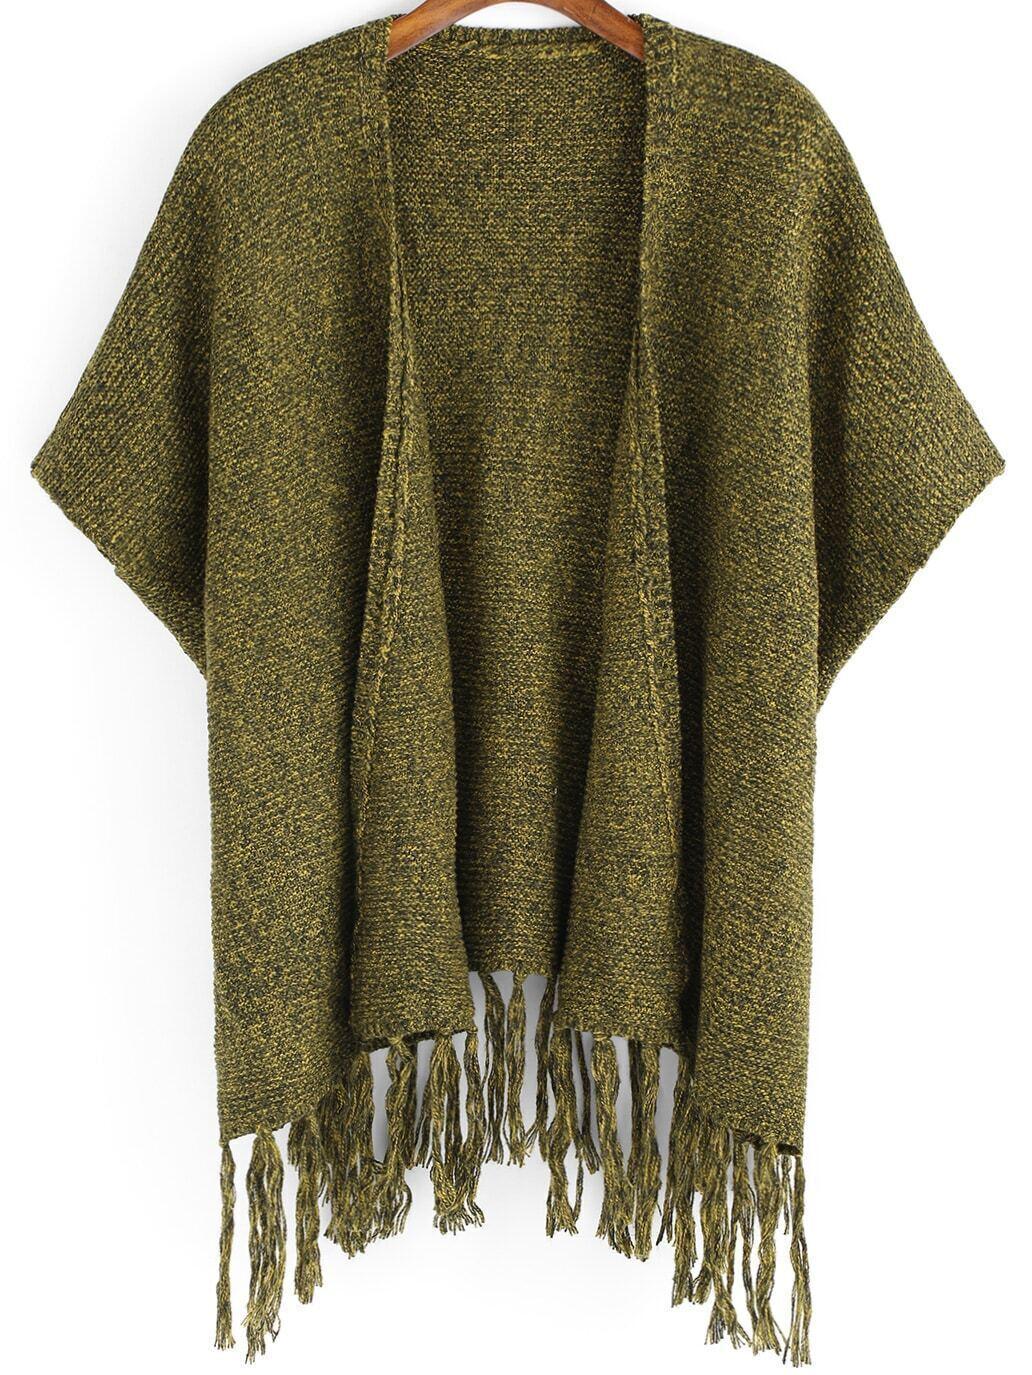 Army Green Batwing Sleeve Tassel Sweater Coat